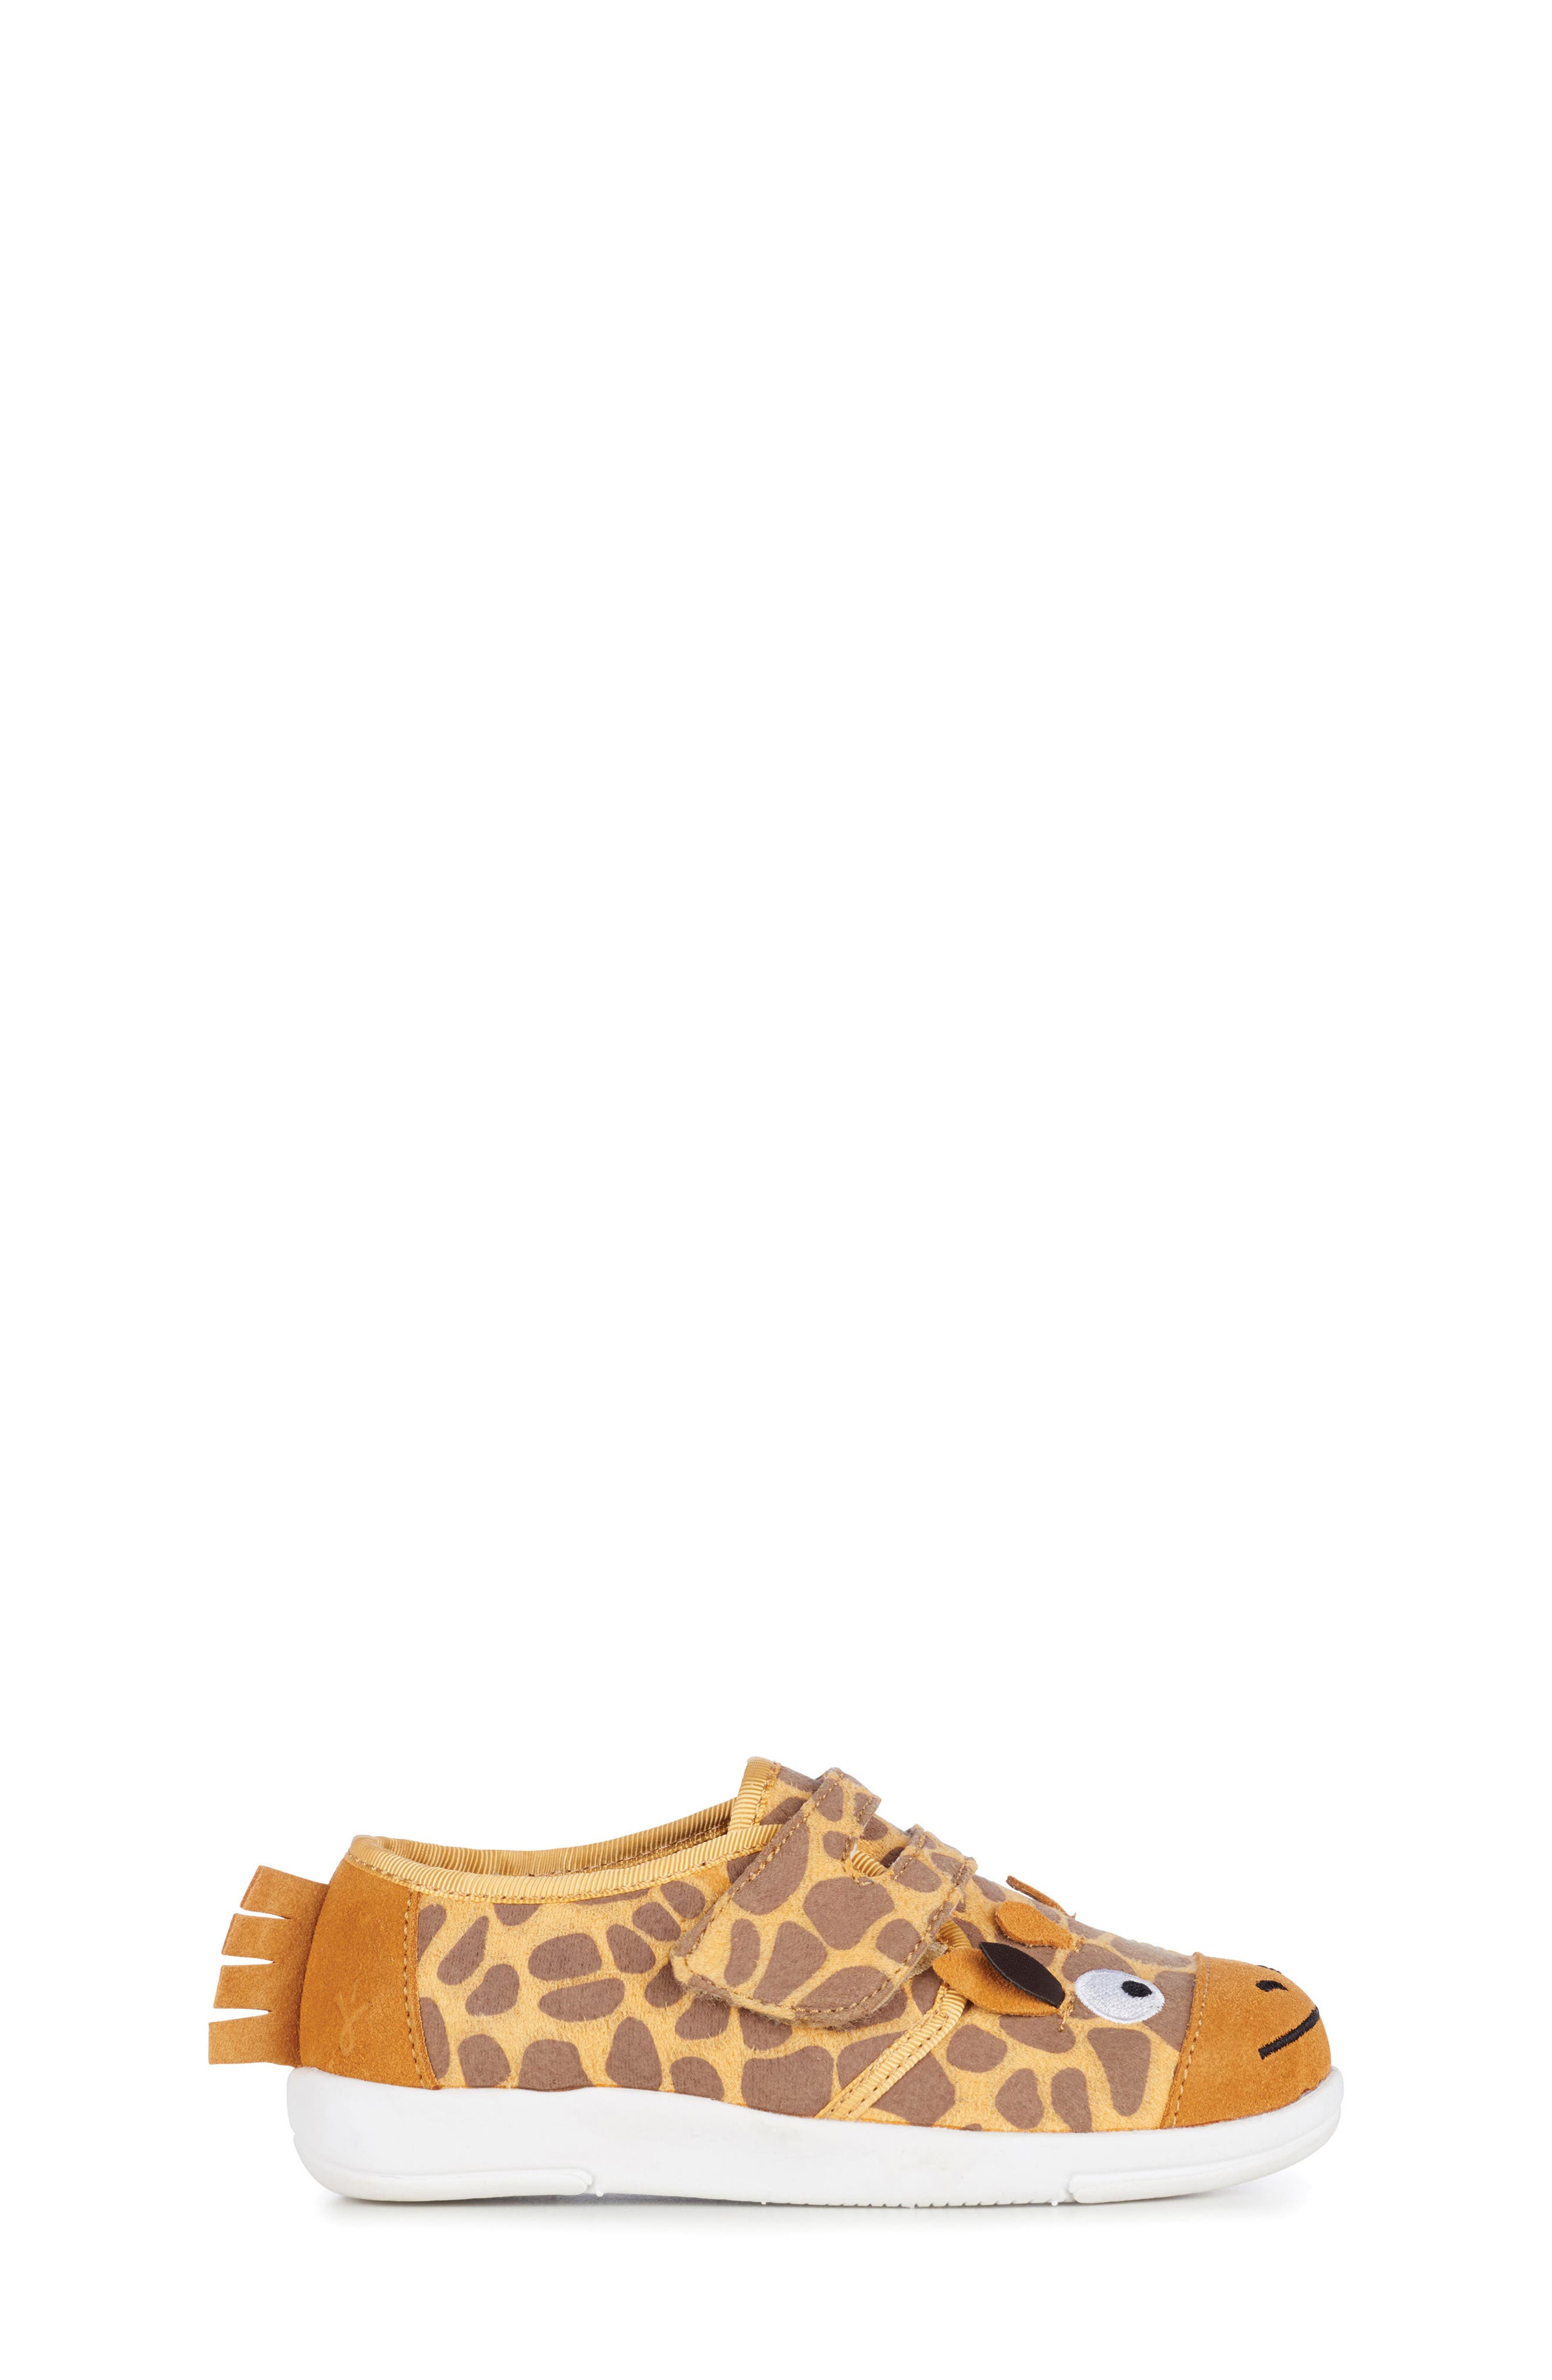 Giraffe Sneaker,                             Alternate thumbnail 3, color,                             Yellow